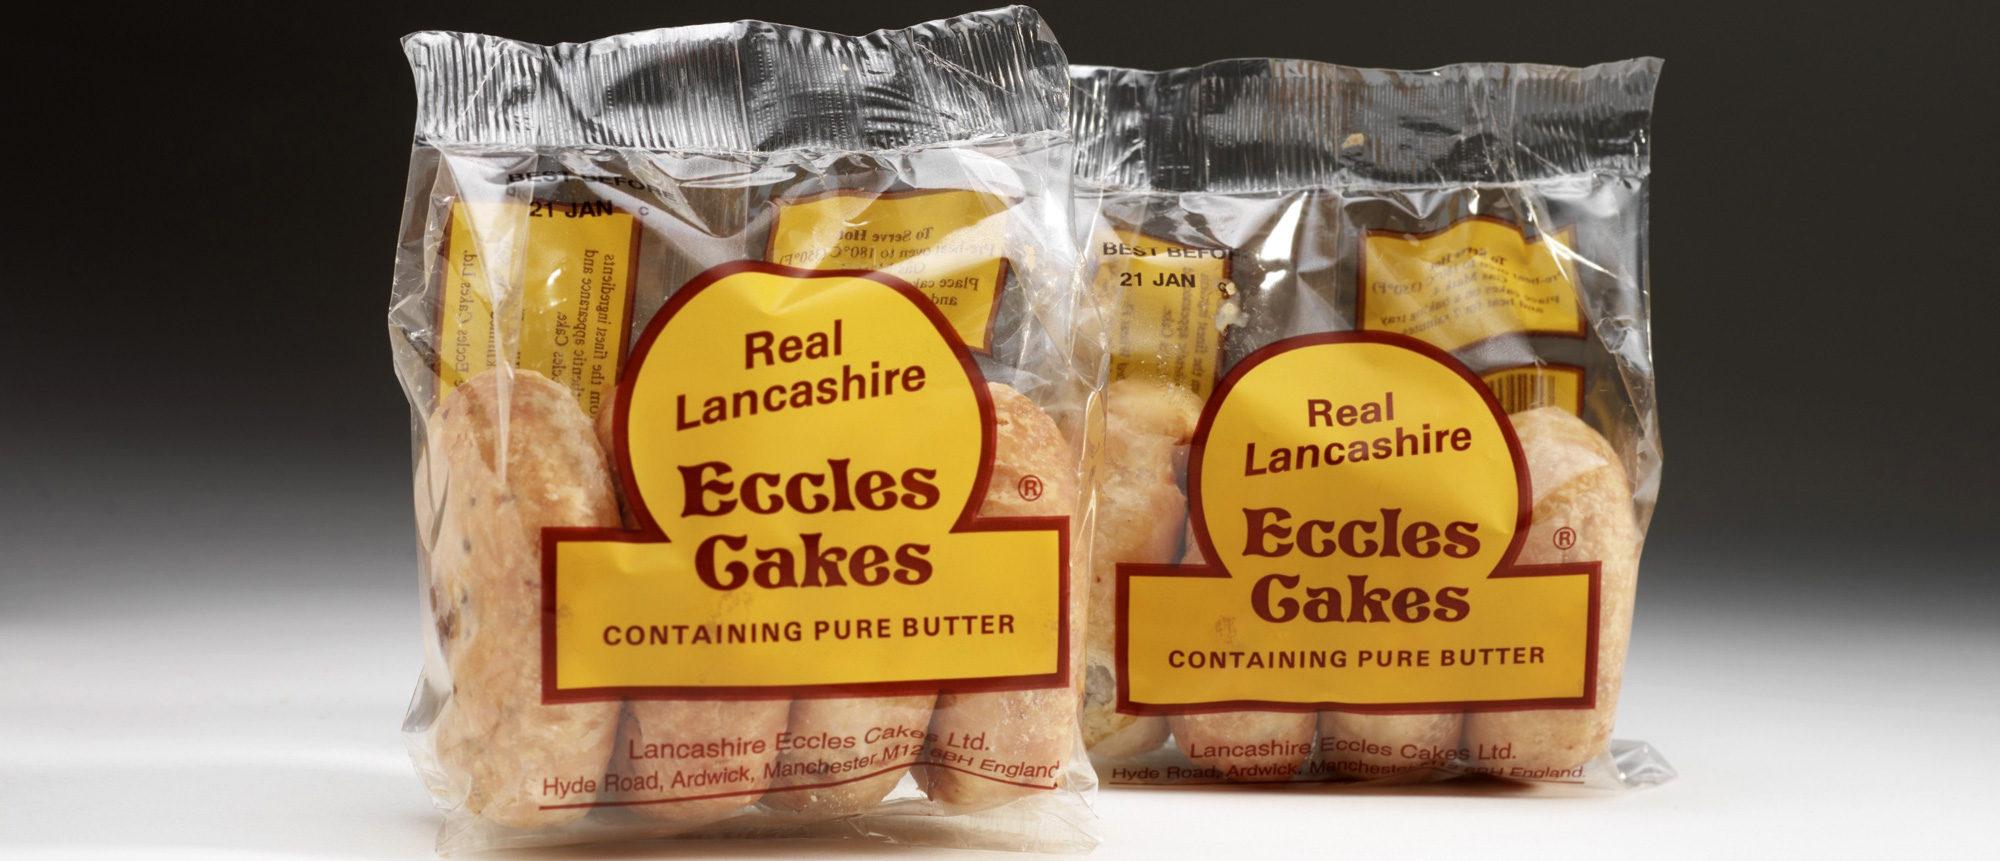 Handmade Eccles Cakes Real Lancashire Eccles Cakes